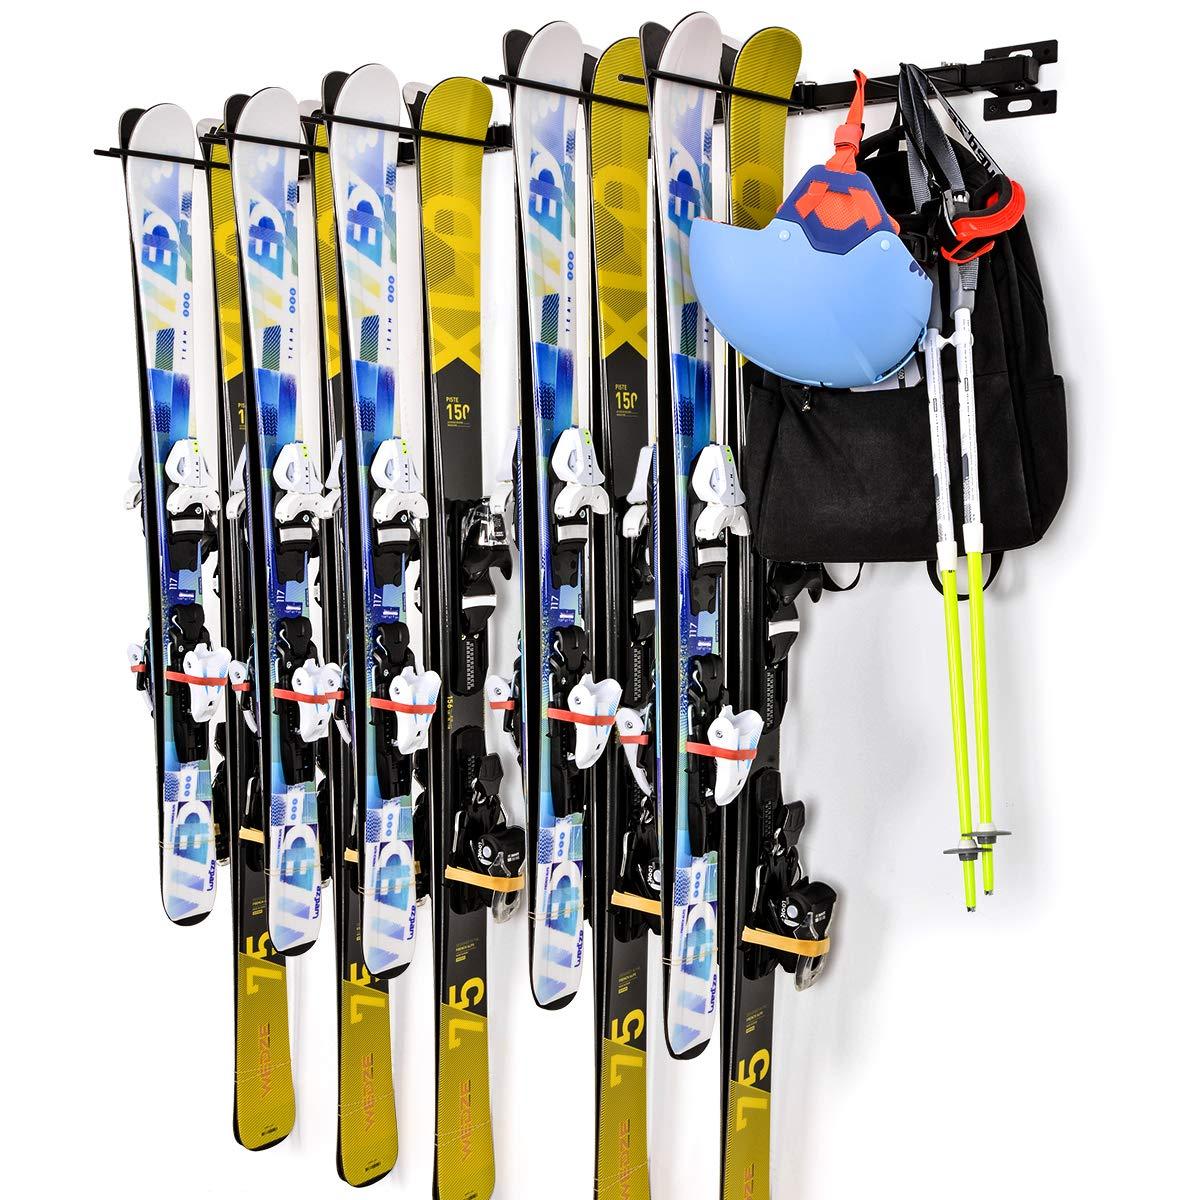 Sunix Ski Wall Storage Rack, Ski and Snowboard Wall Storage Rack Home and Garage Ski Mount Hold up 10 Pairs, 2 Pack